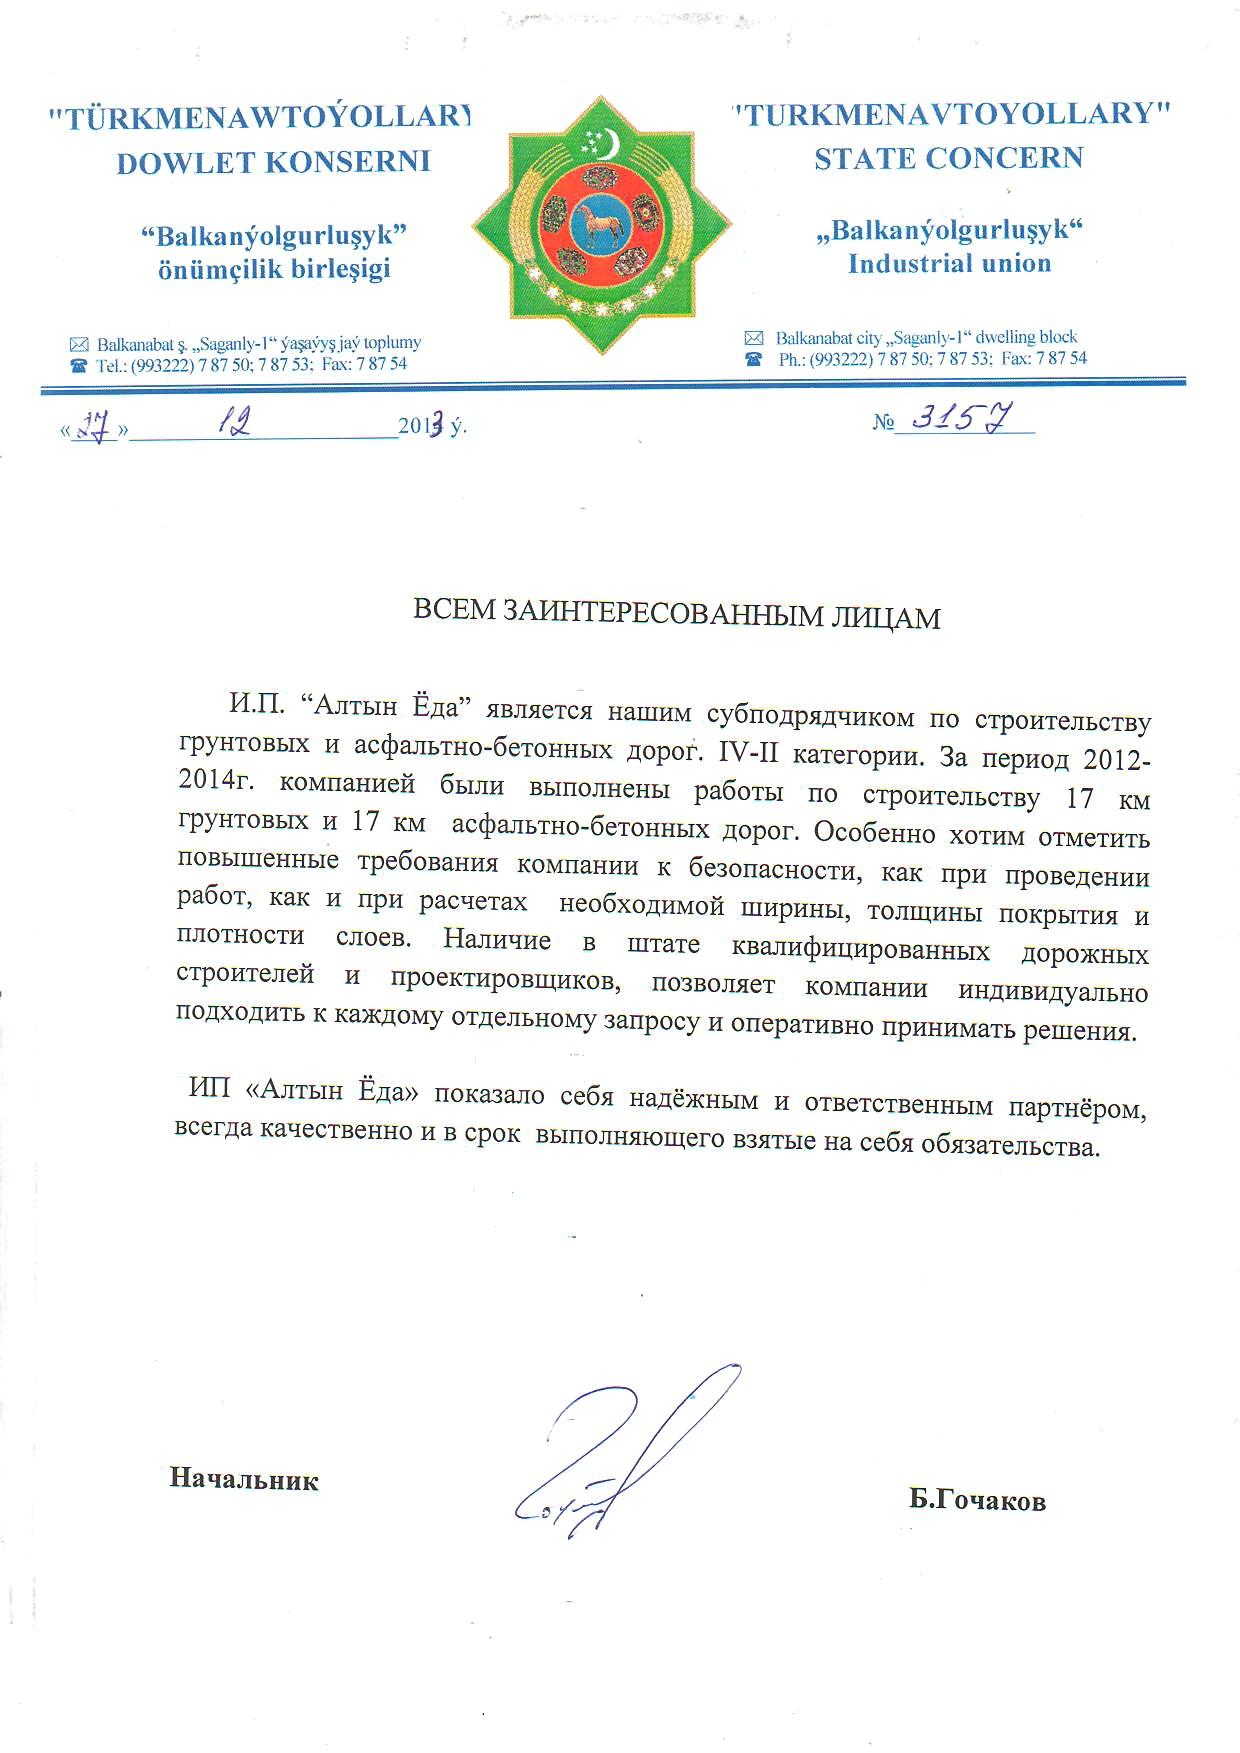 Reference letter Turkmenavtoyollary